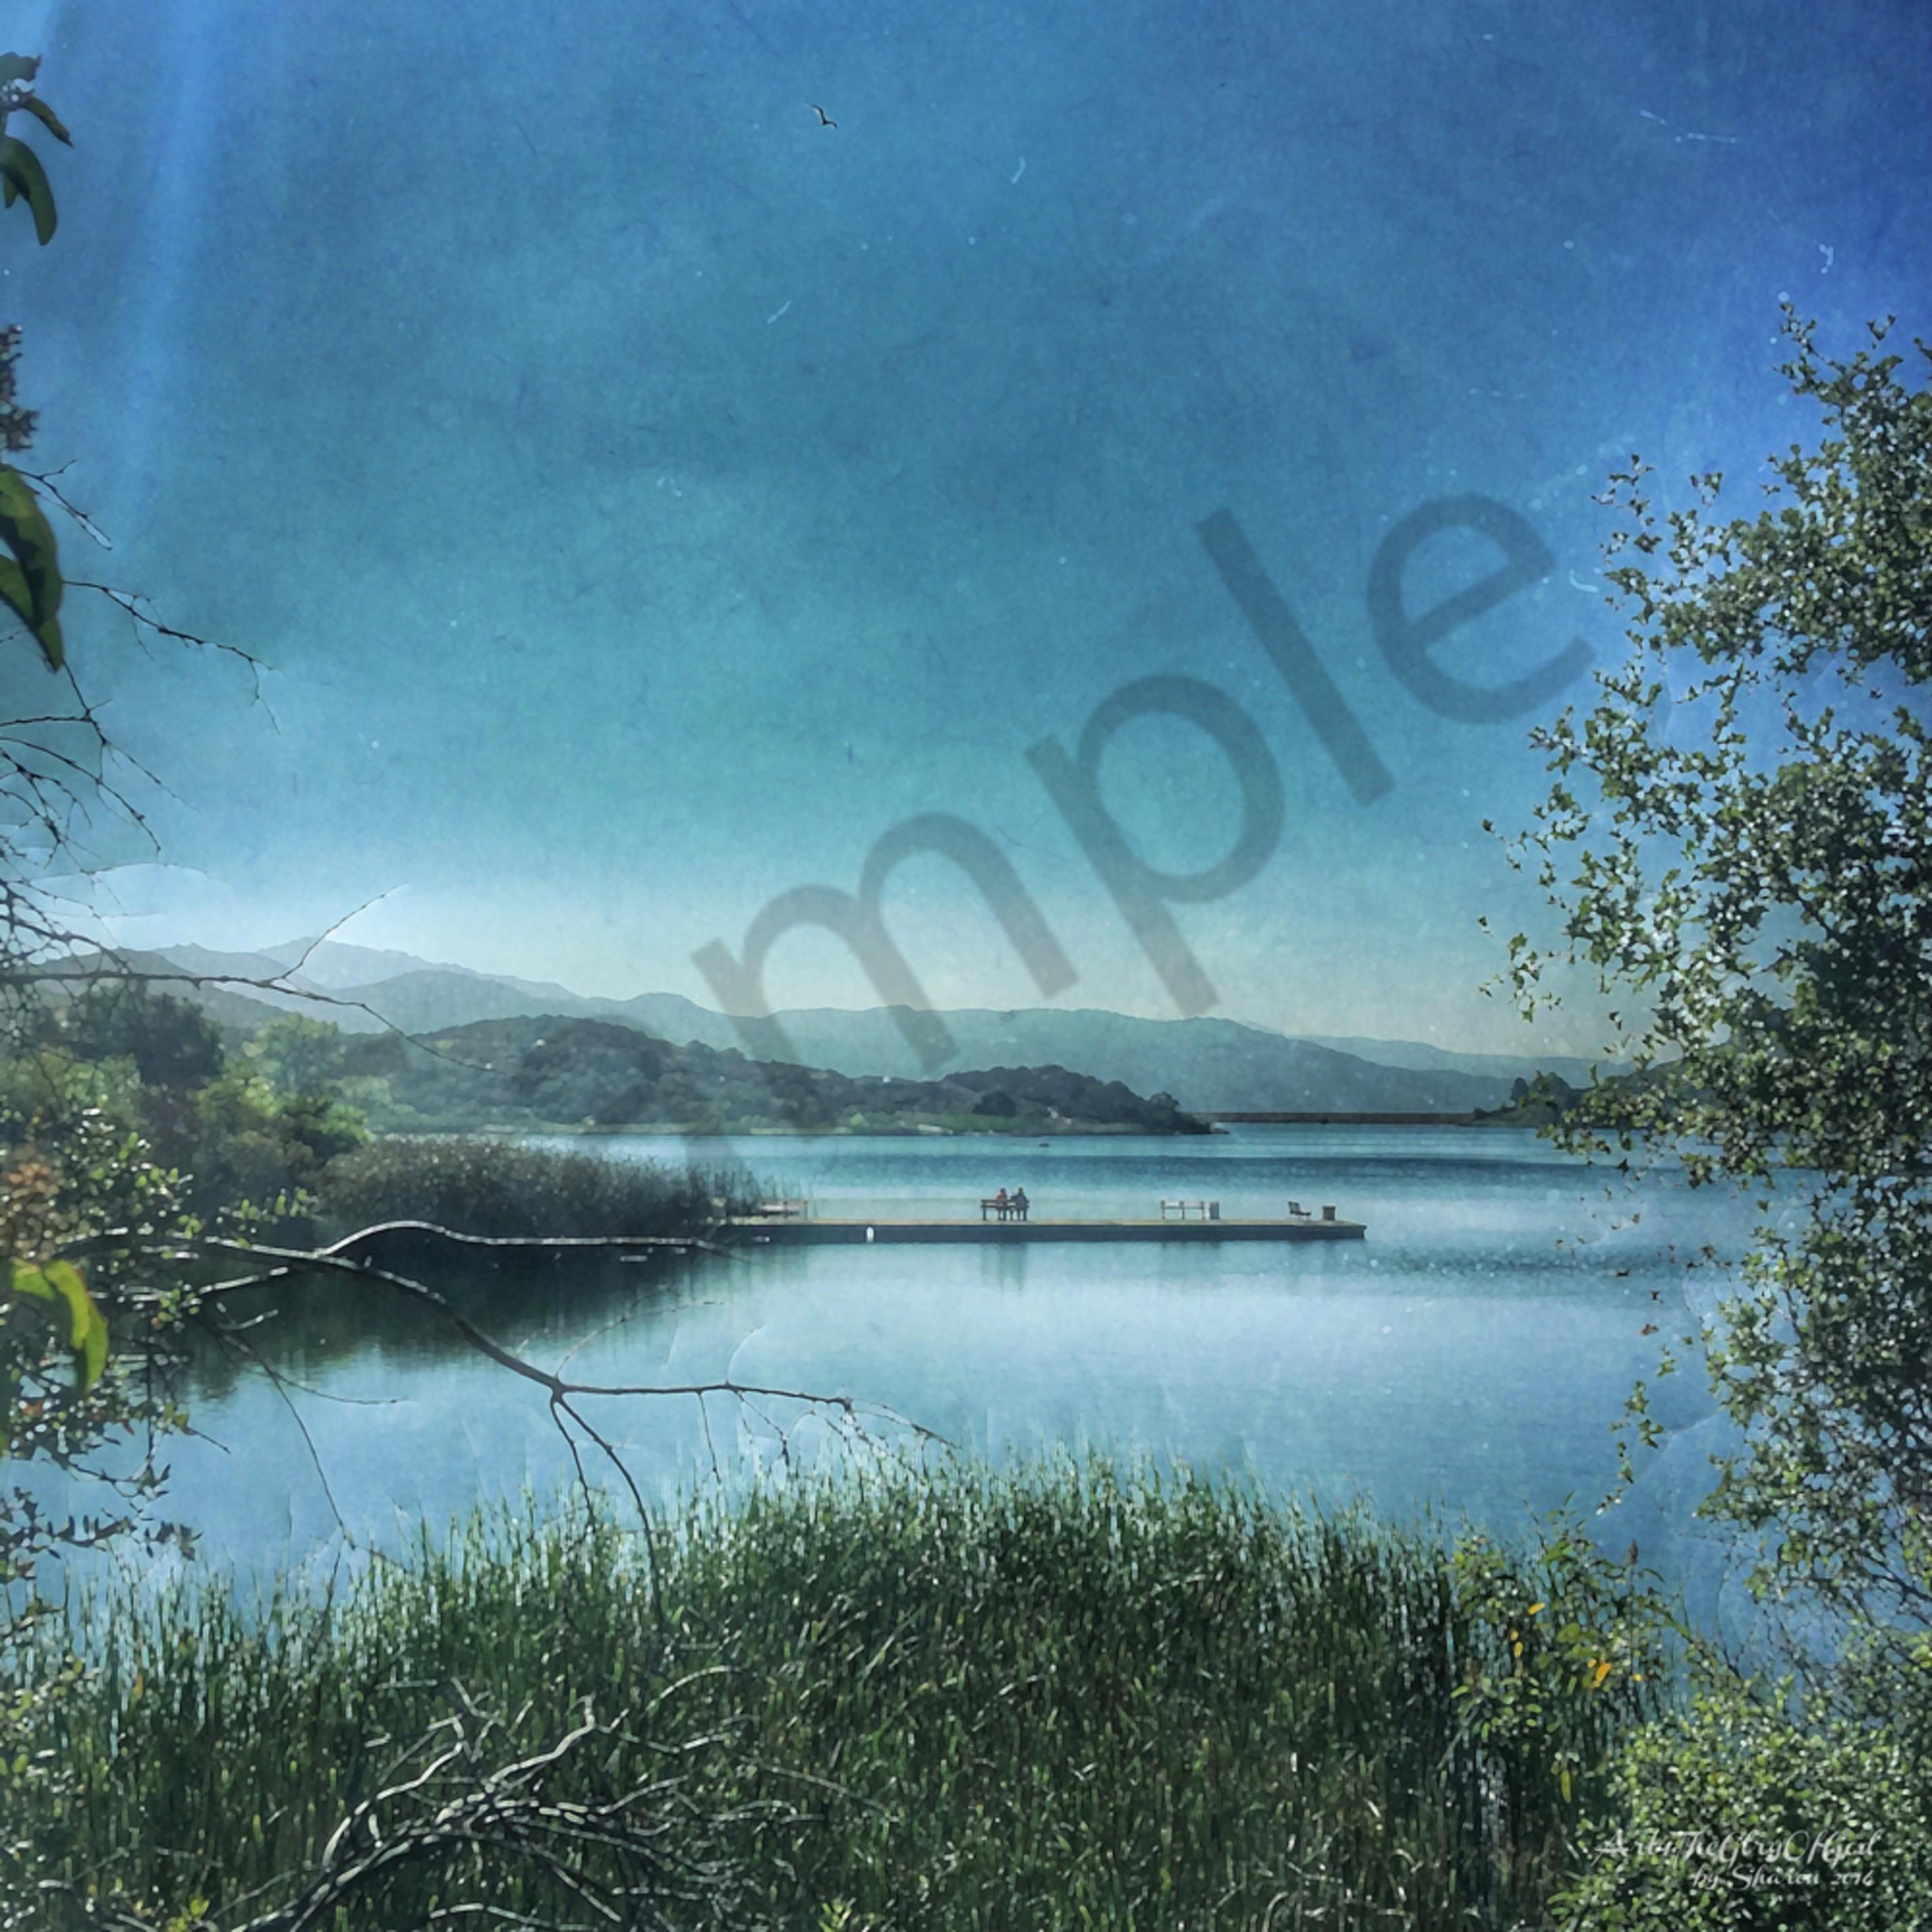 Img 3625 lake dixon morning walk   iphone texture 2016   i desire mercy   ps paint daubs art4theglryofgod vmam4t